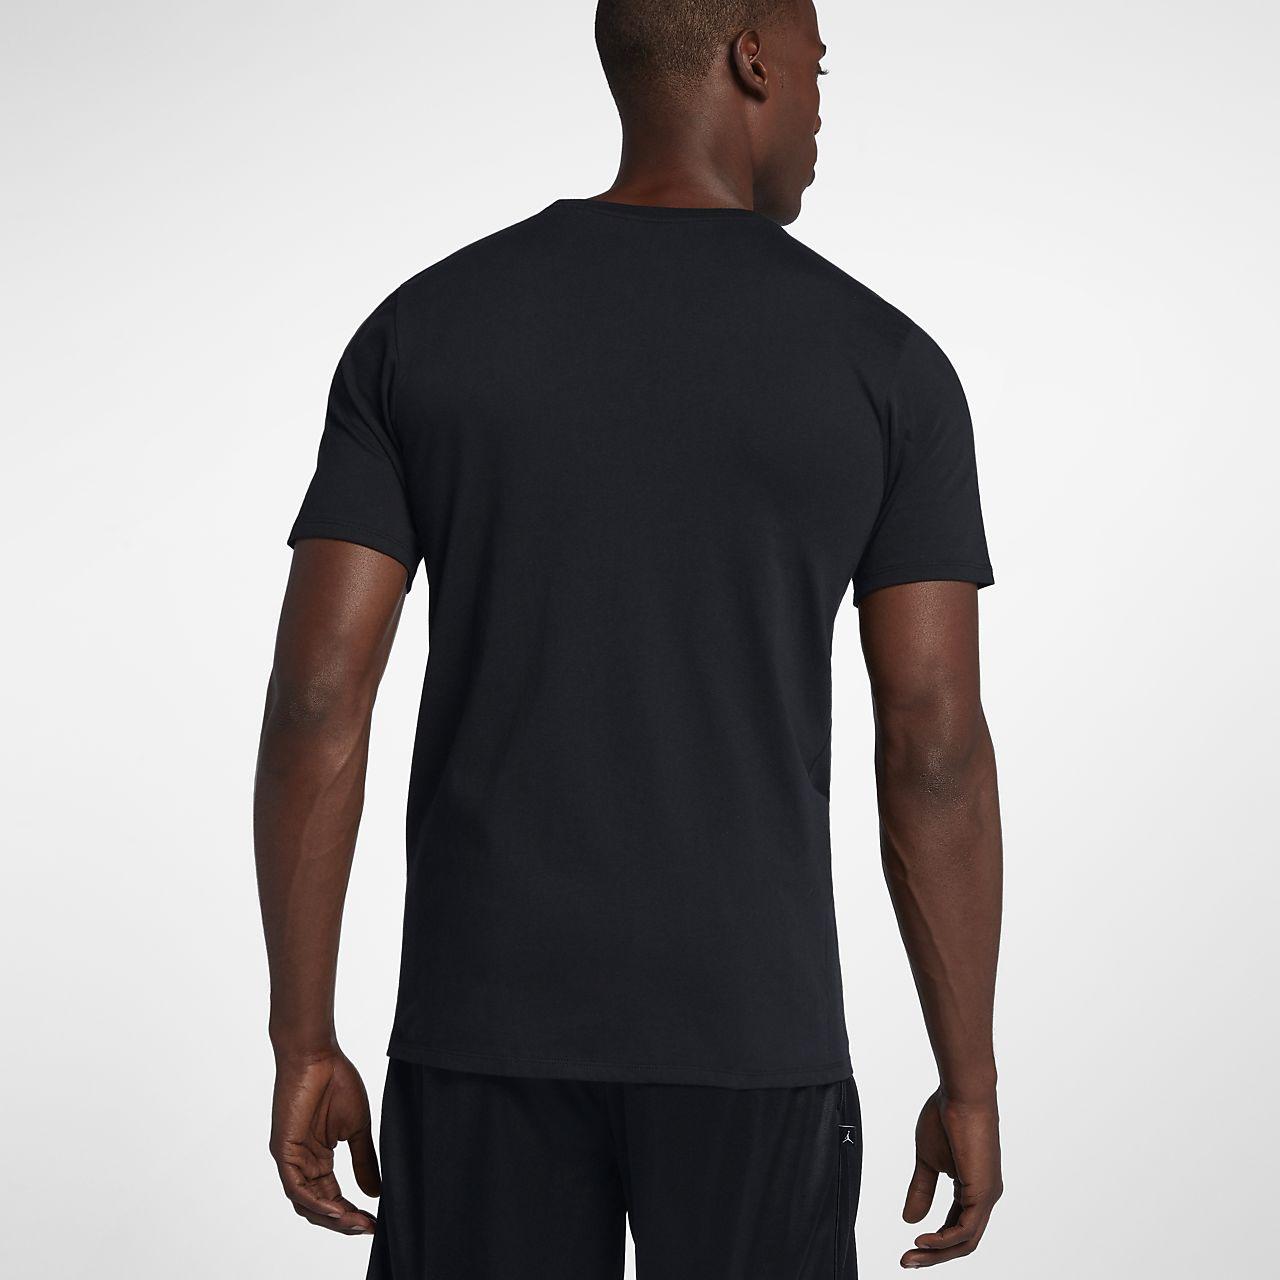 e0e6b2edba6d Jordan Sportswear